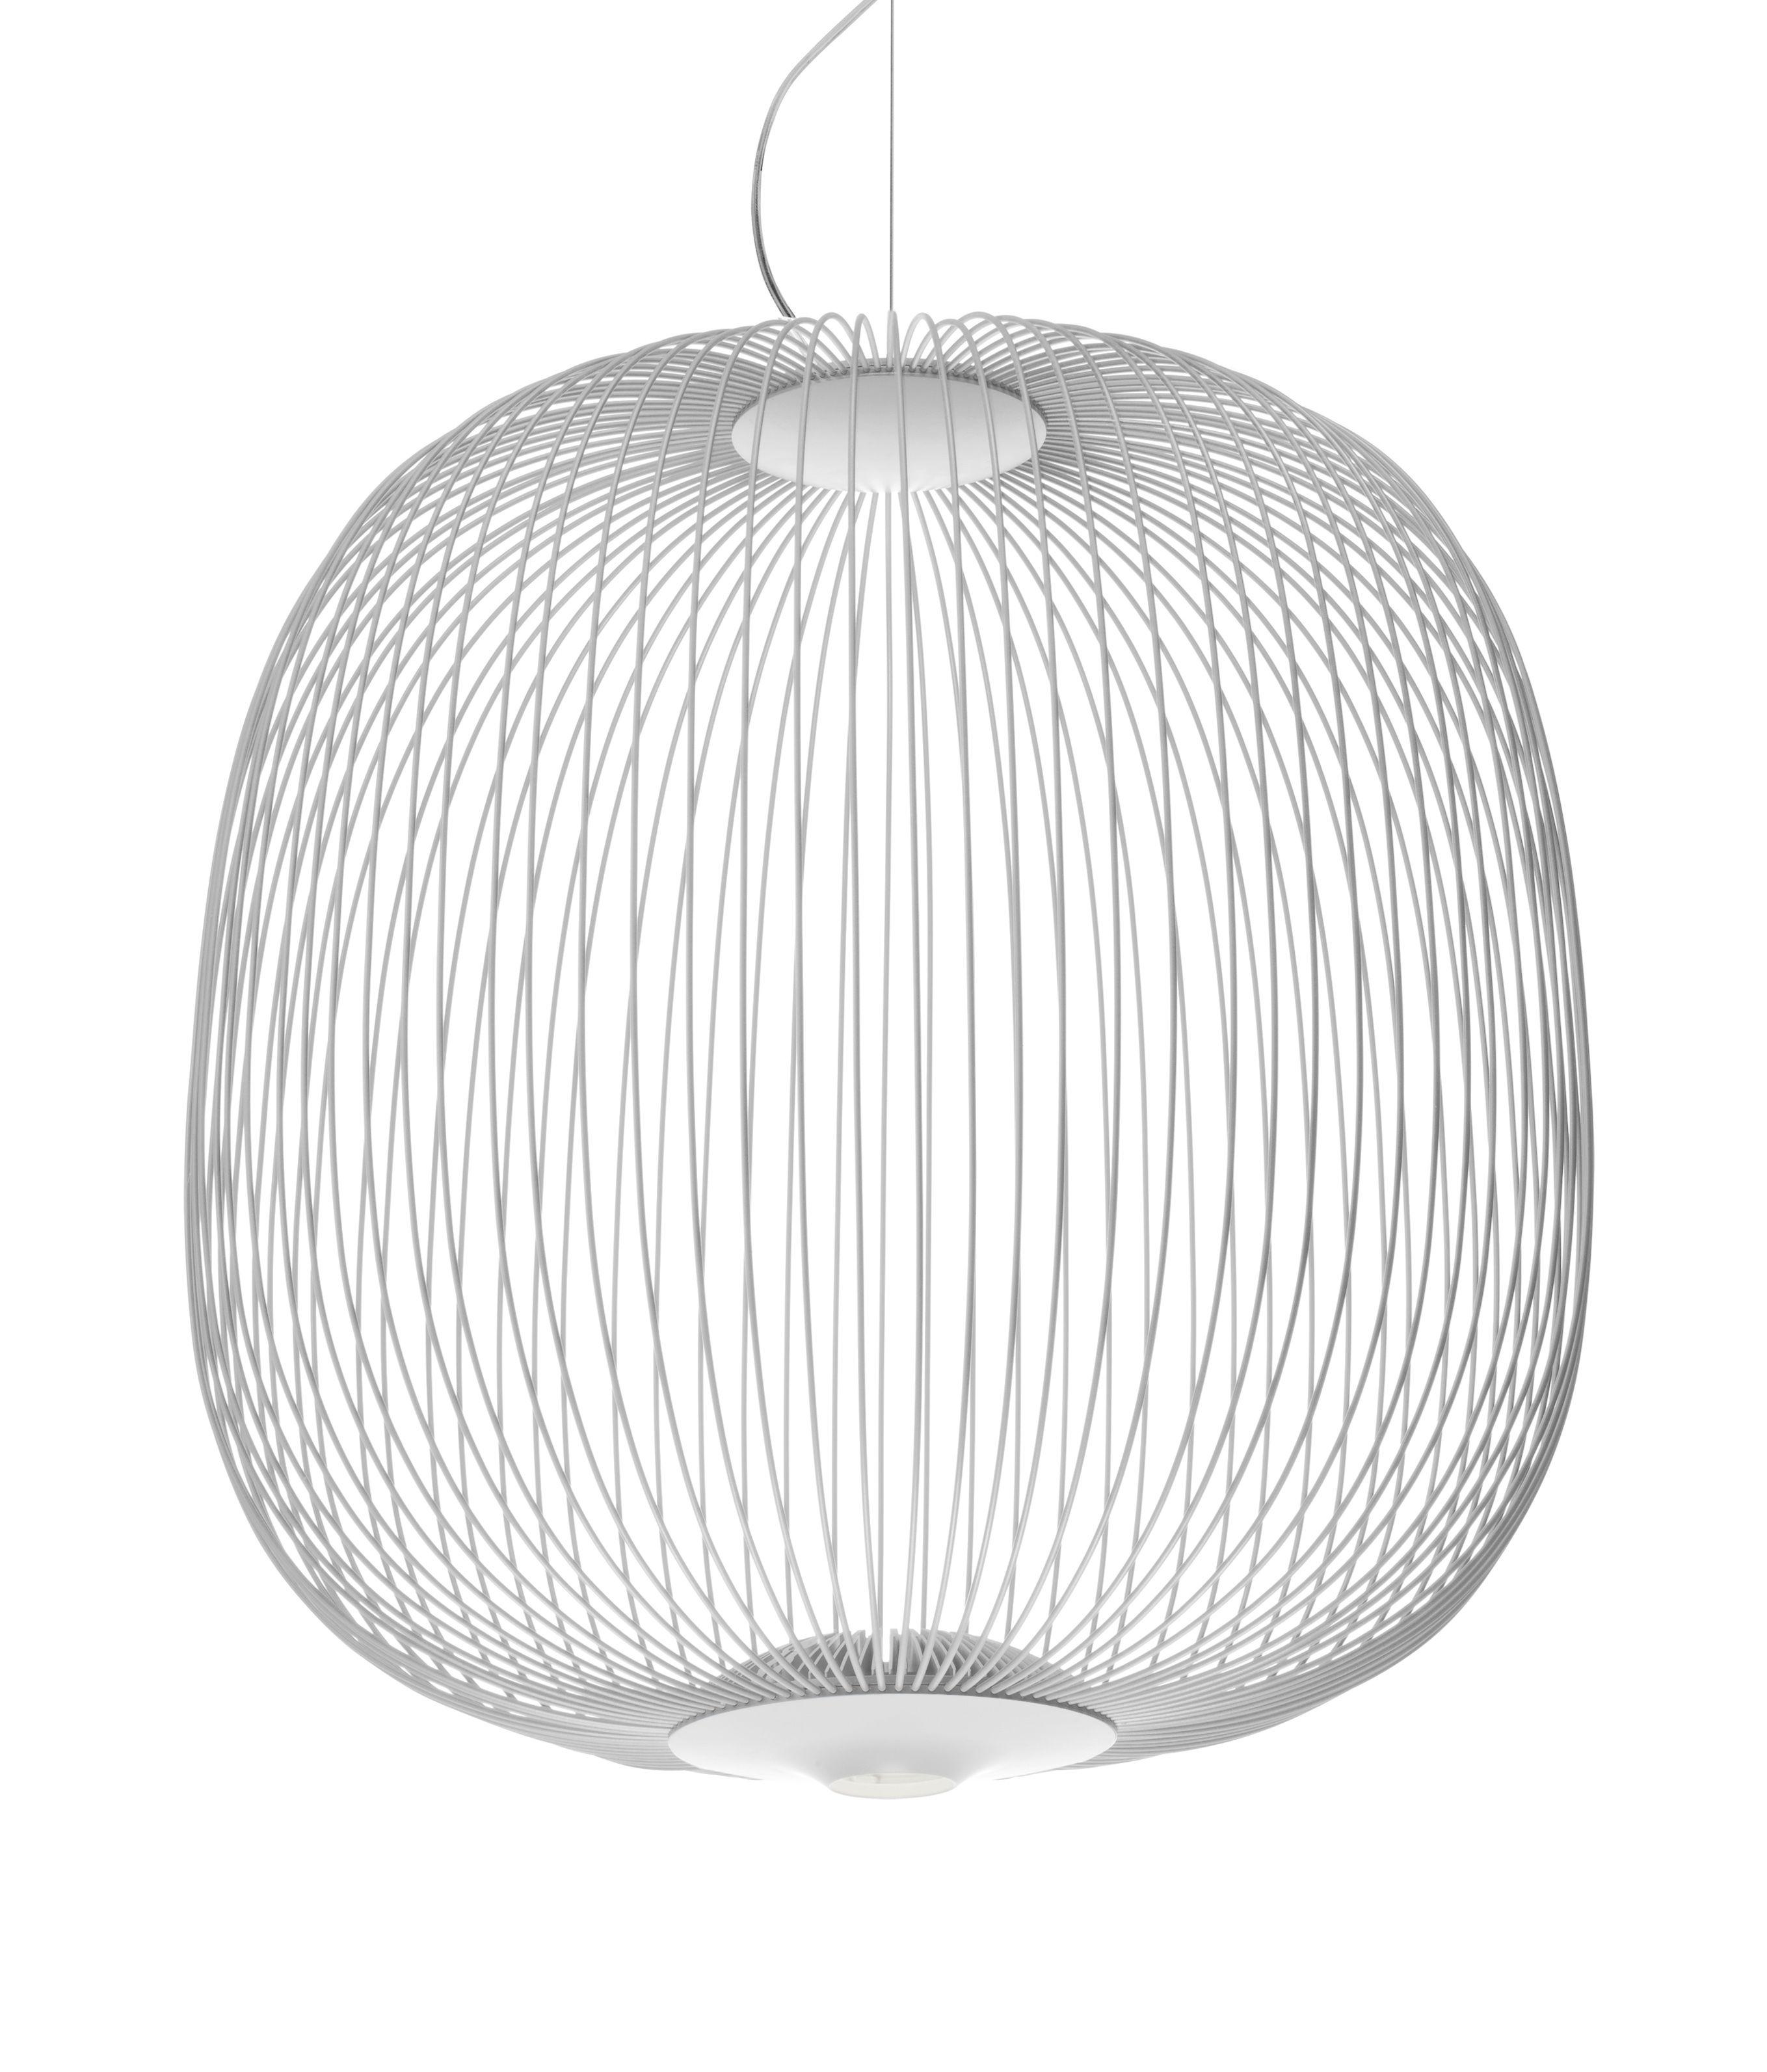 Leuchten - Pendelleuchten - Spokes 2 Small Pendelleuchte / LED - Ø 52 cm x H 52,5 cm - Foscarini - Weiß - Aluminium, lackierter Stahl